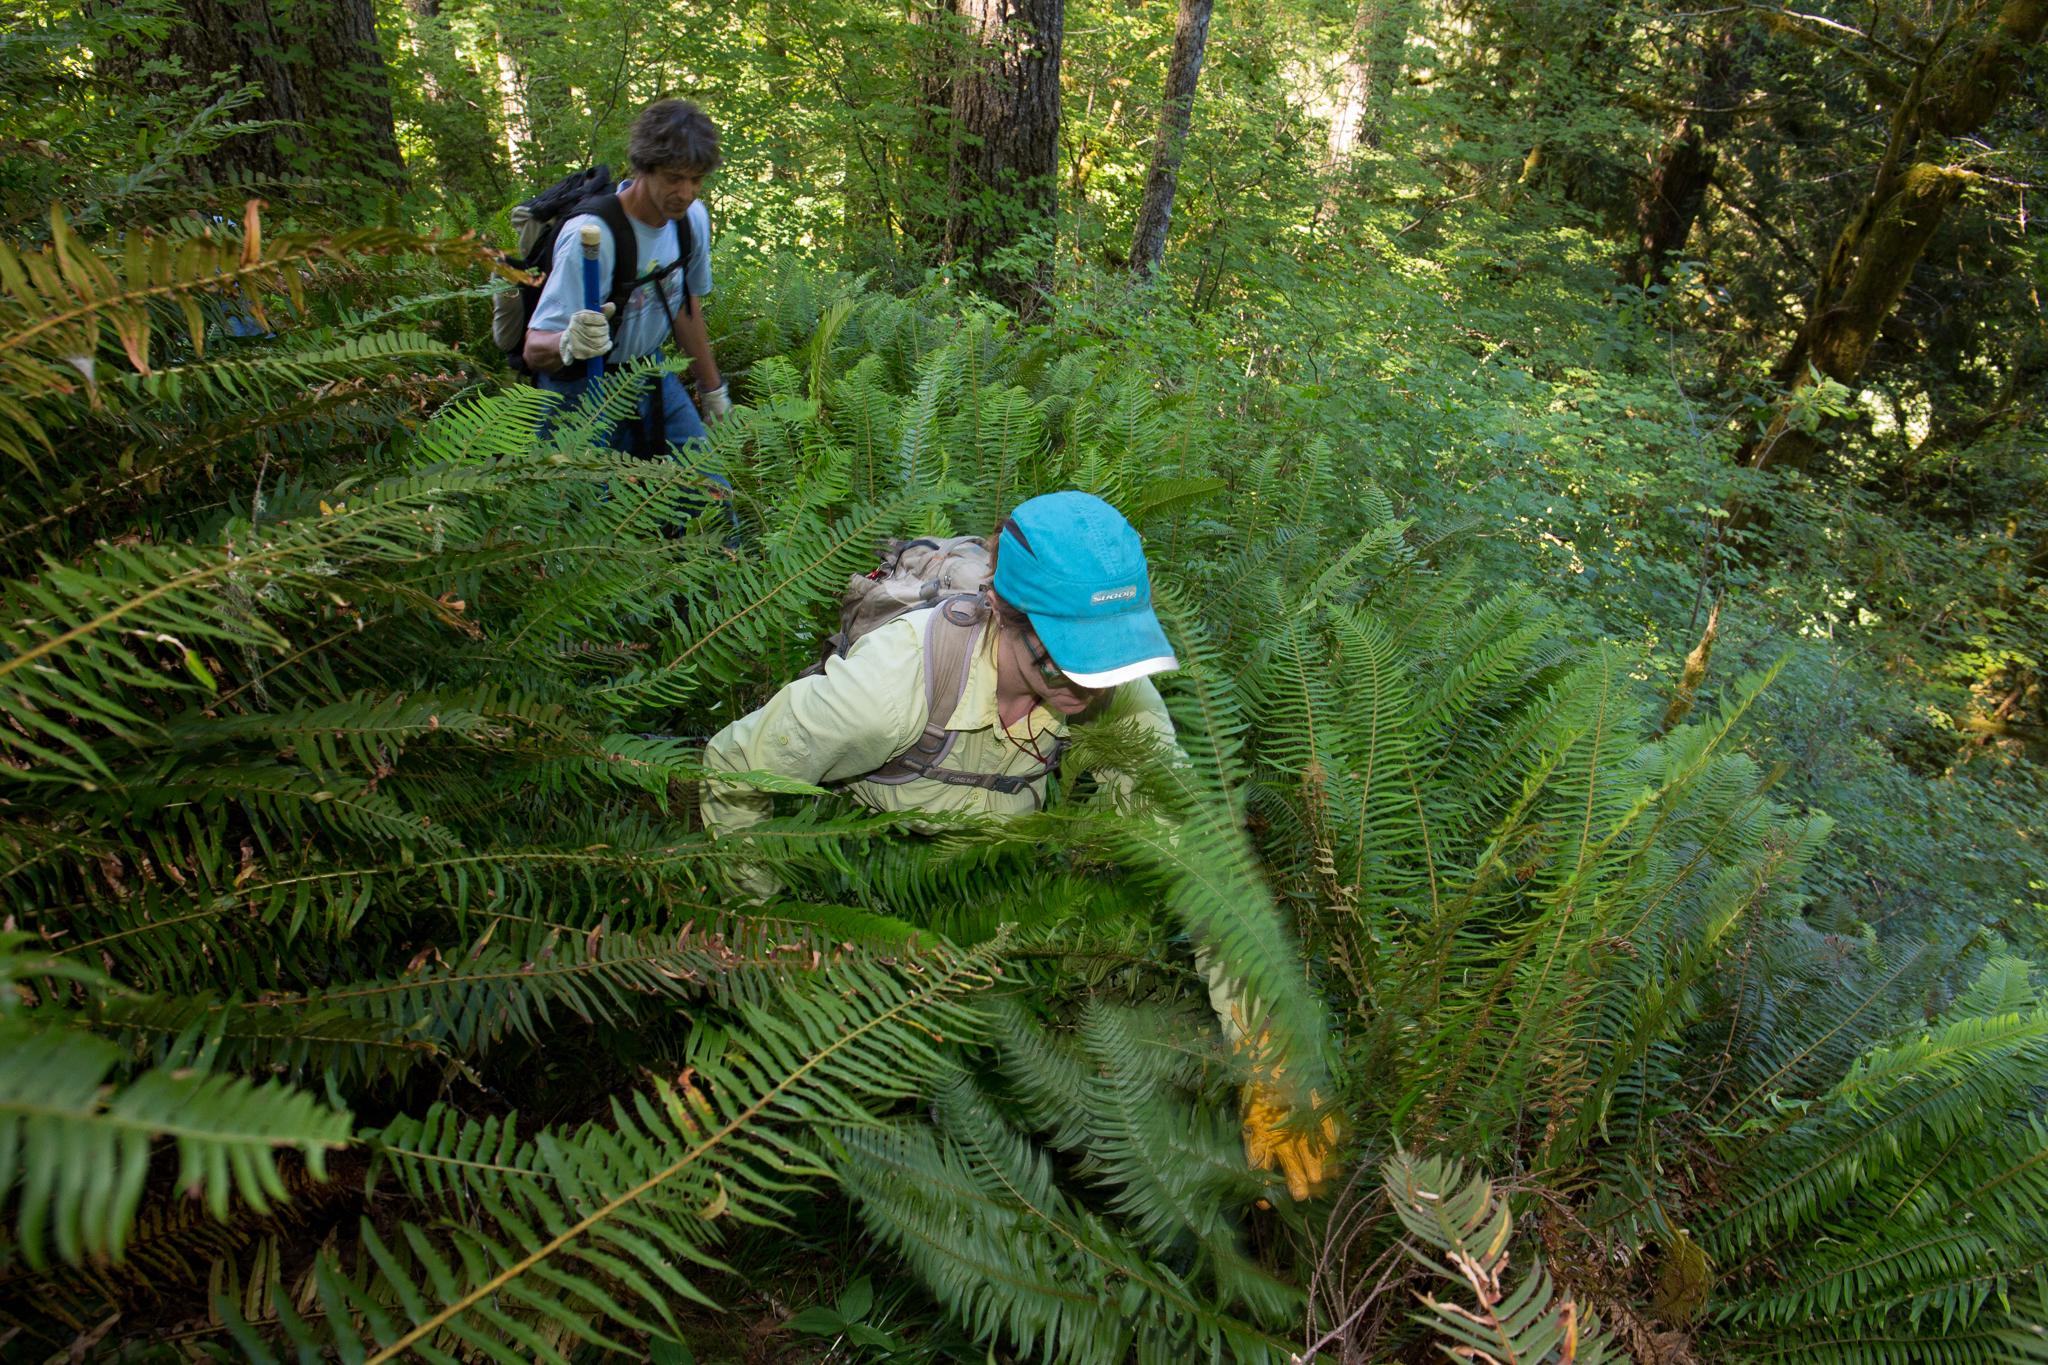 Oregon State University researchers trek through the thick undergrowth of ferns in Oregon's Coast Range.